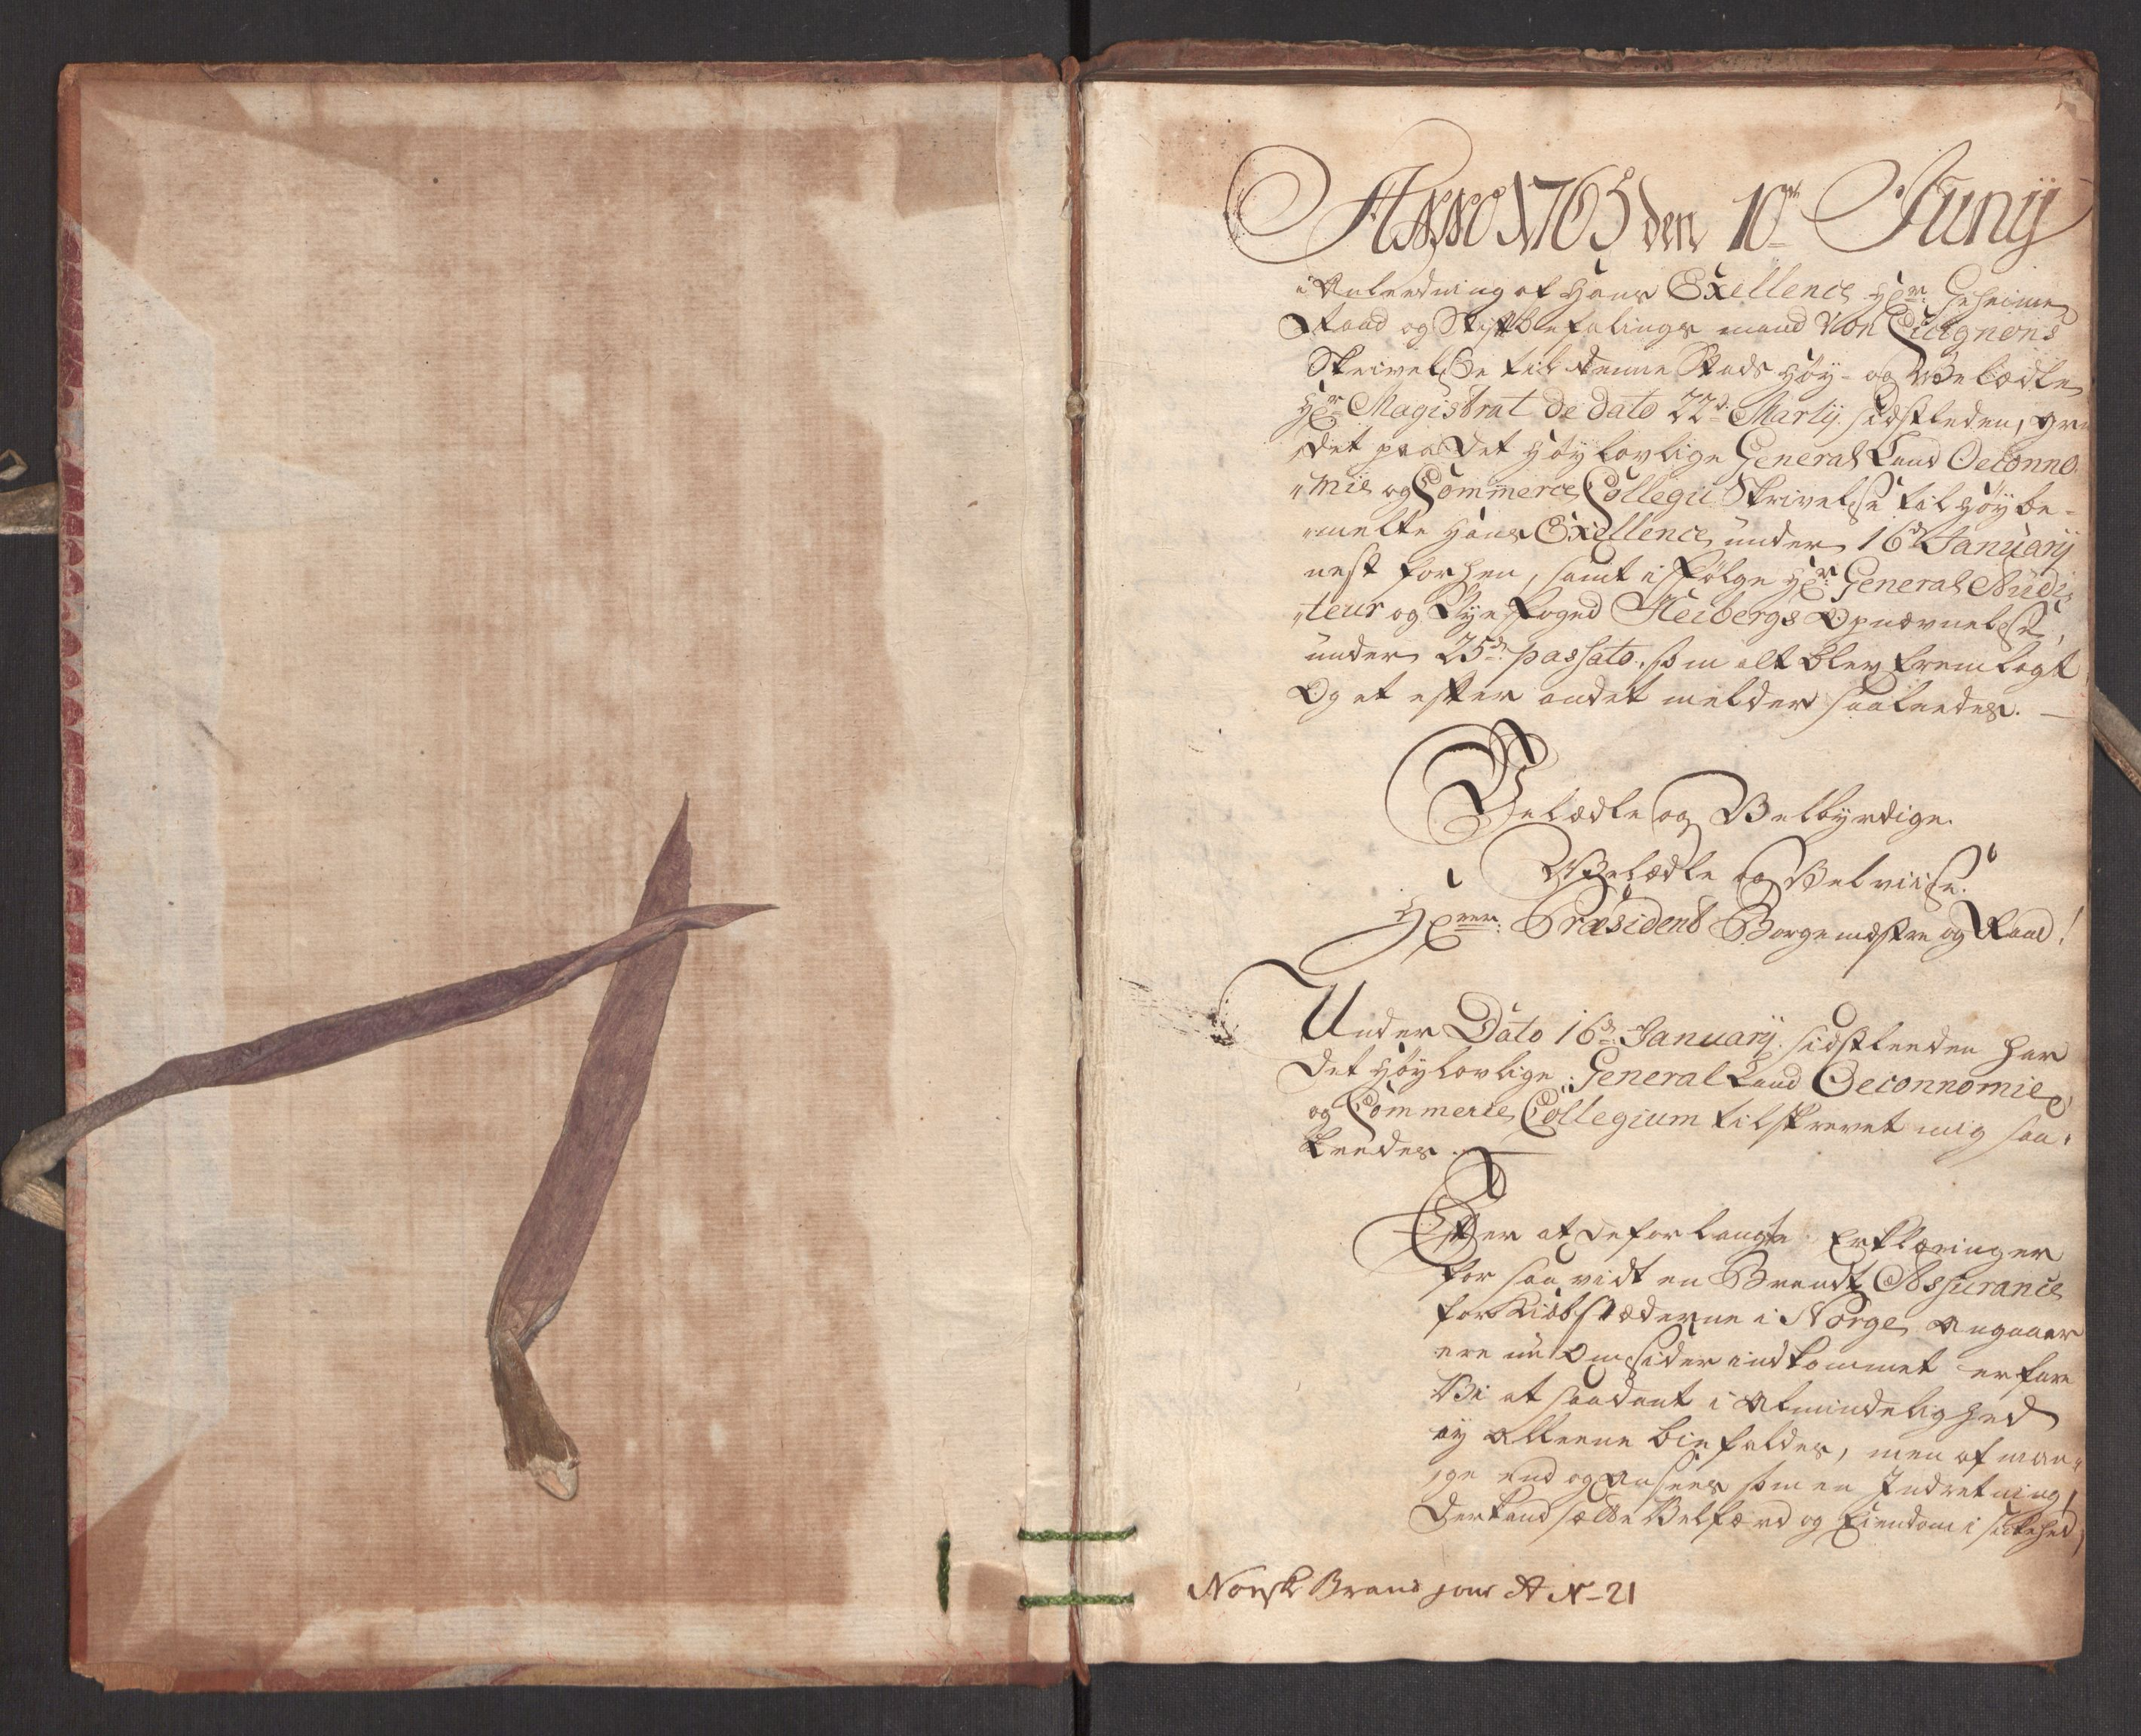 RA, Kommersekollegiet, Brannforsikringskontoret 1767-1814, F/Fa/L0004: Bergen, 1767